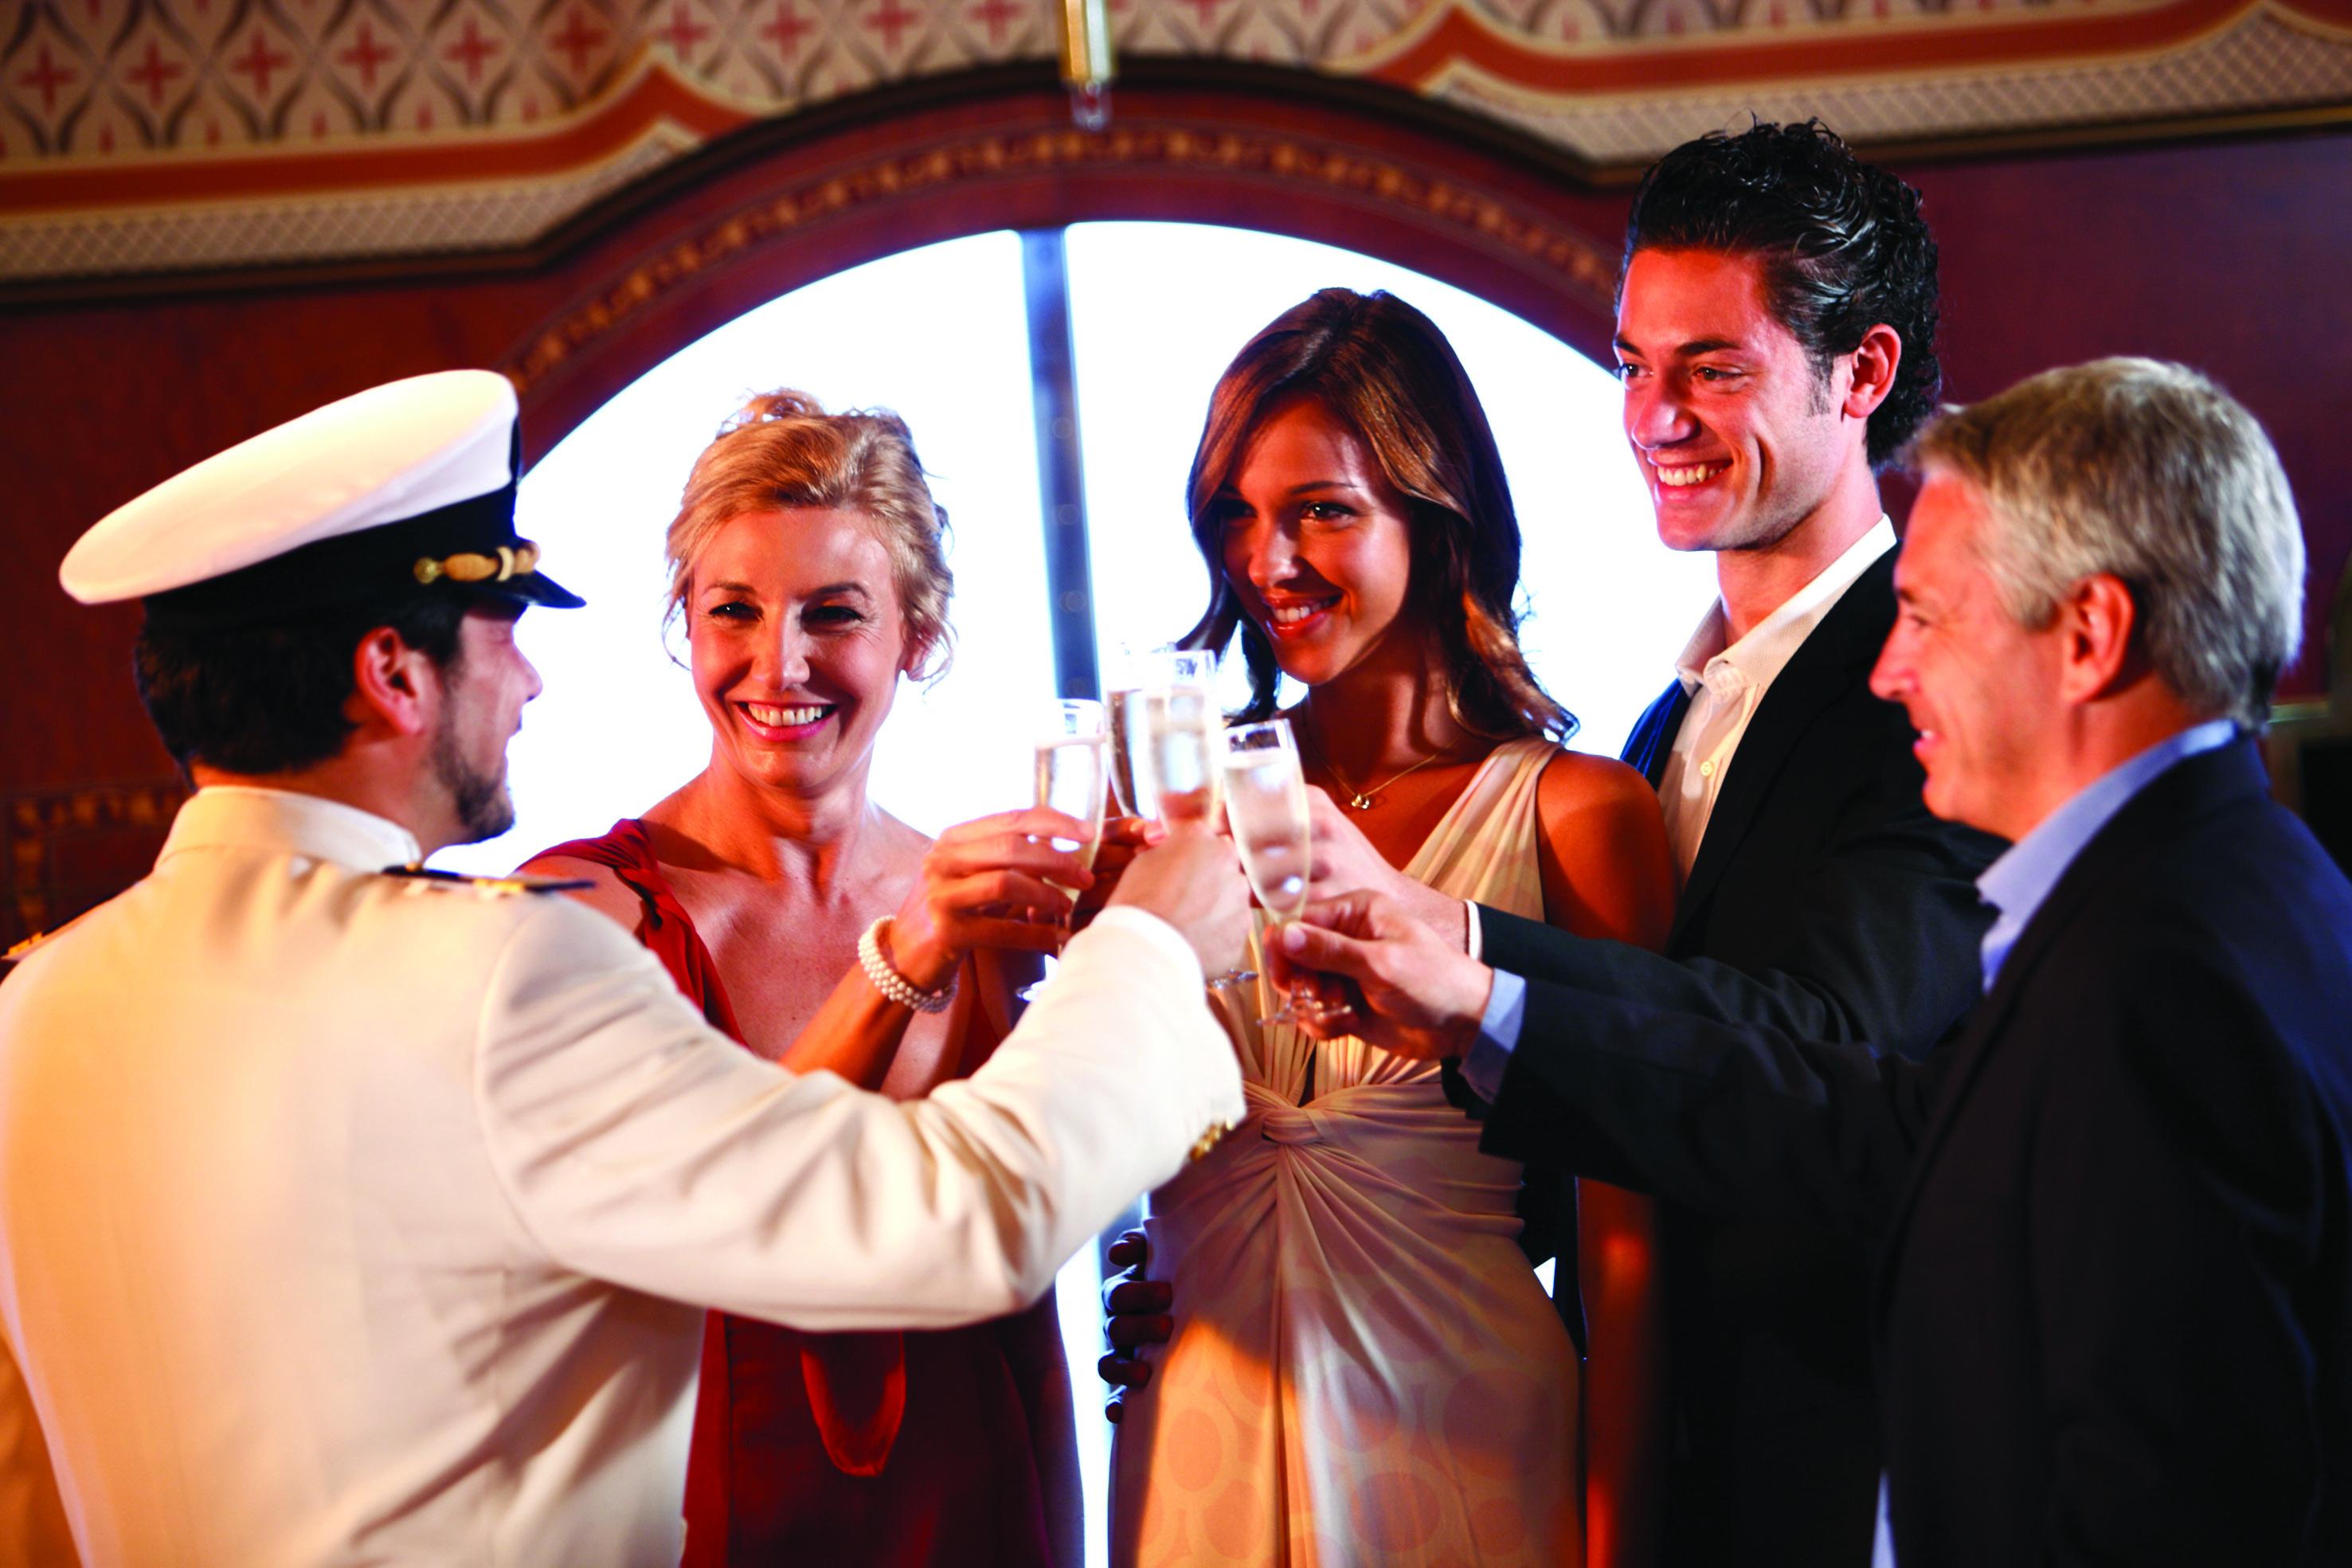 ��ʫ������ Costa Cruise Lines ���к��� Mediterranea ӡ��������ĵ���ë����˹-�����-����������-����˹�ӣ�18���������� 2019��11��07�ձ������� ·��˹�۵Ǵ� ���߱��:7719110711